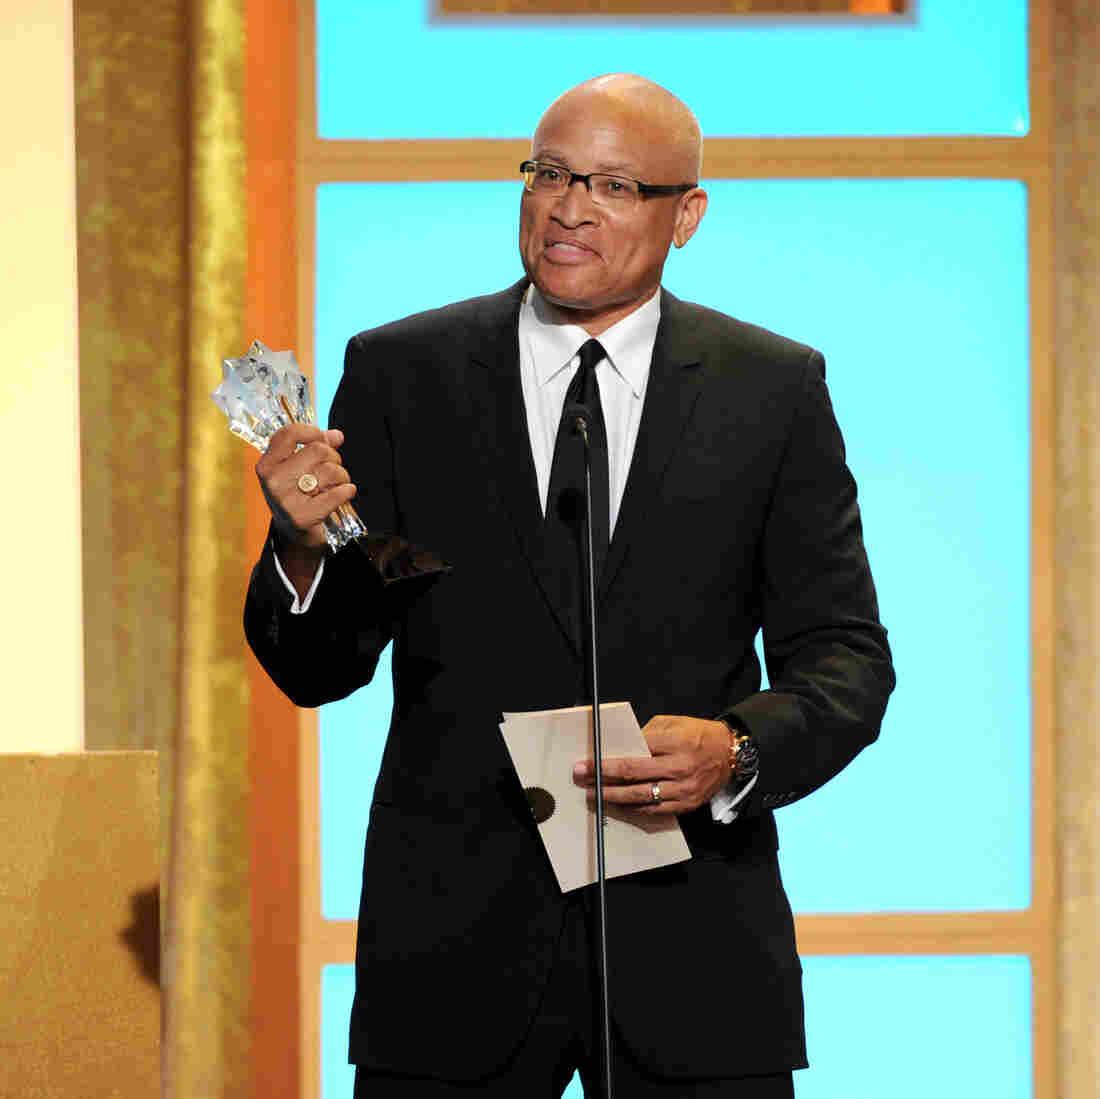 'Senior Black Correspondent' Larry Wilmore Takes Colbert Slot